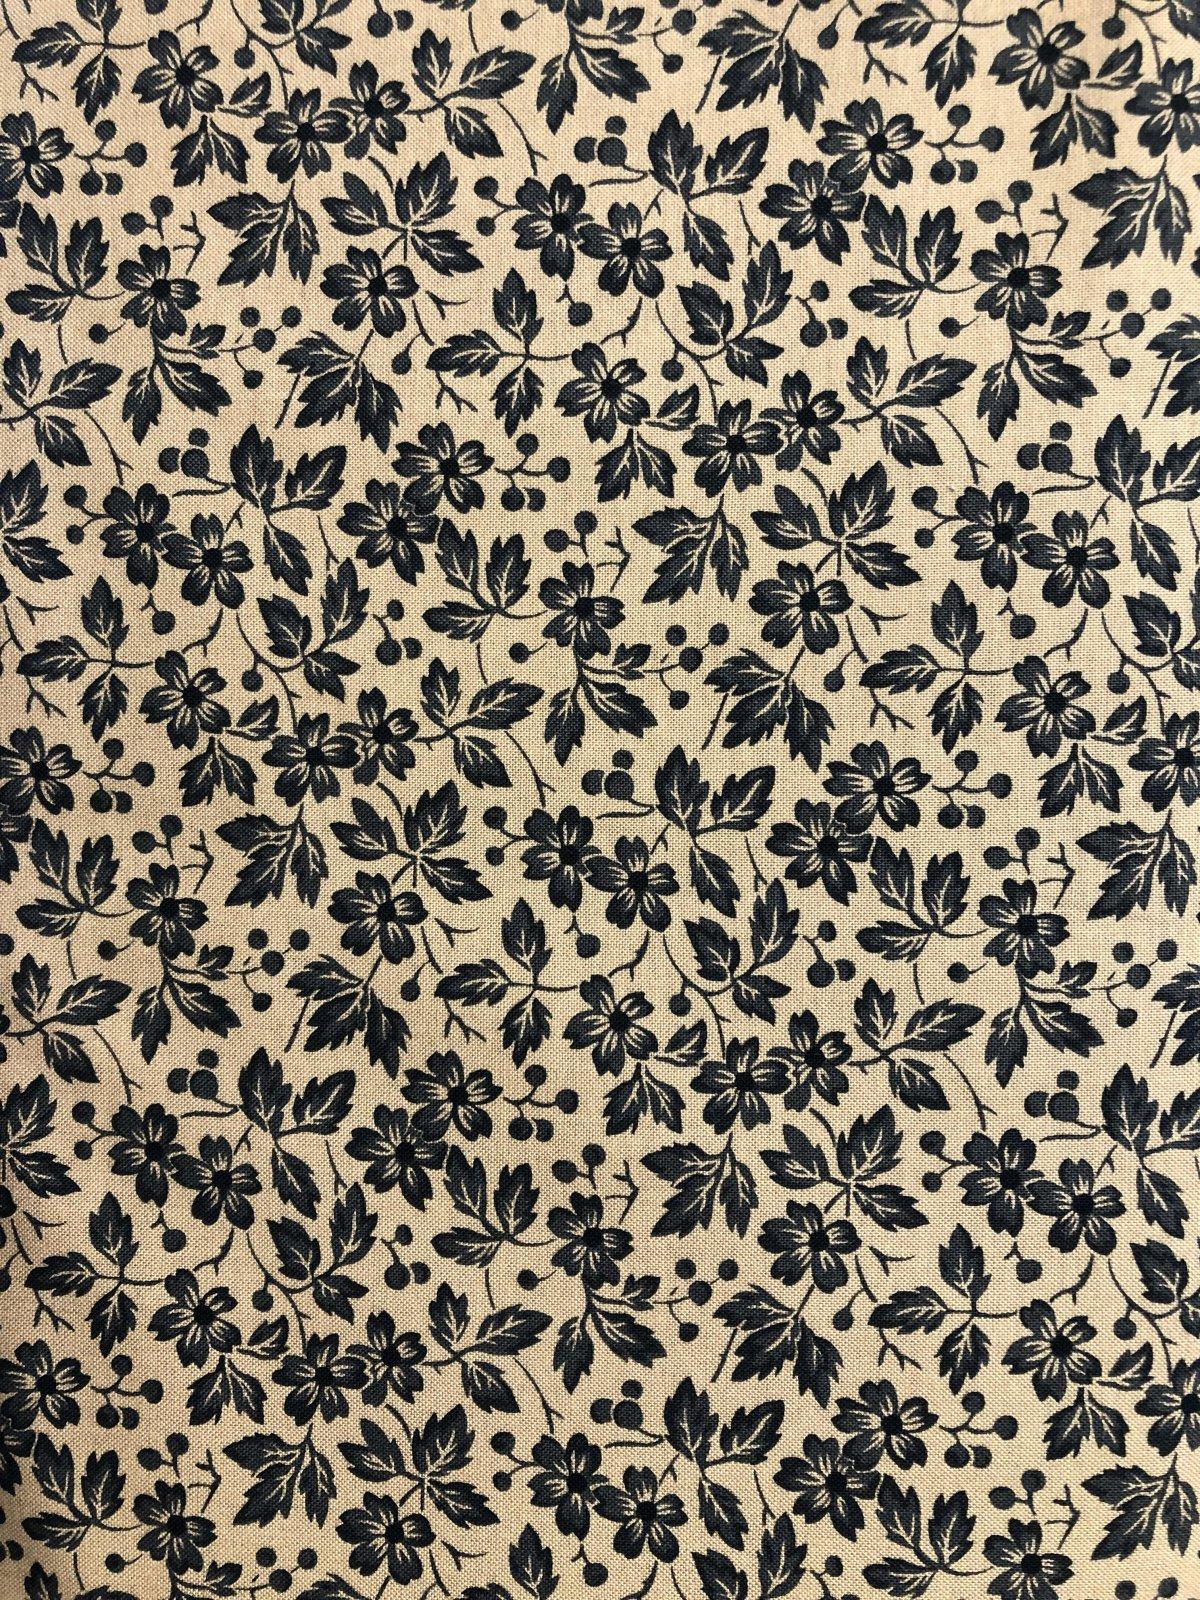 Black Flowers - 8619-J